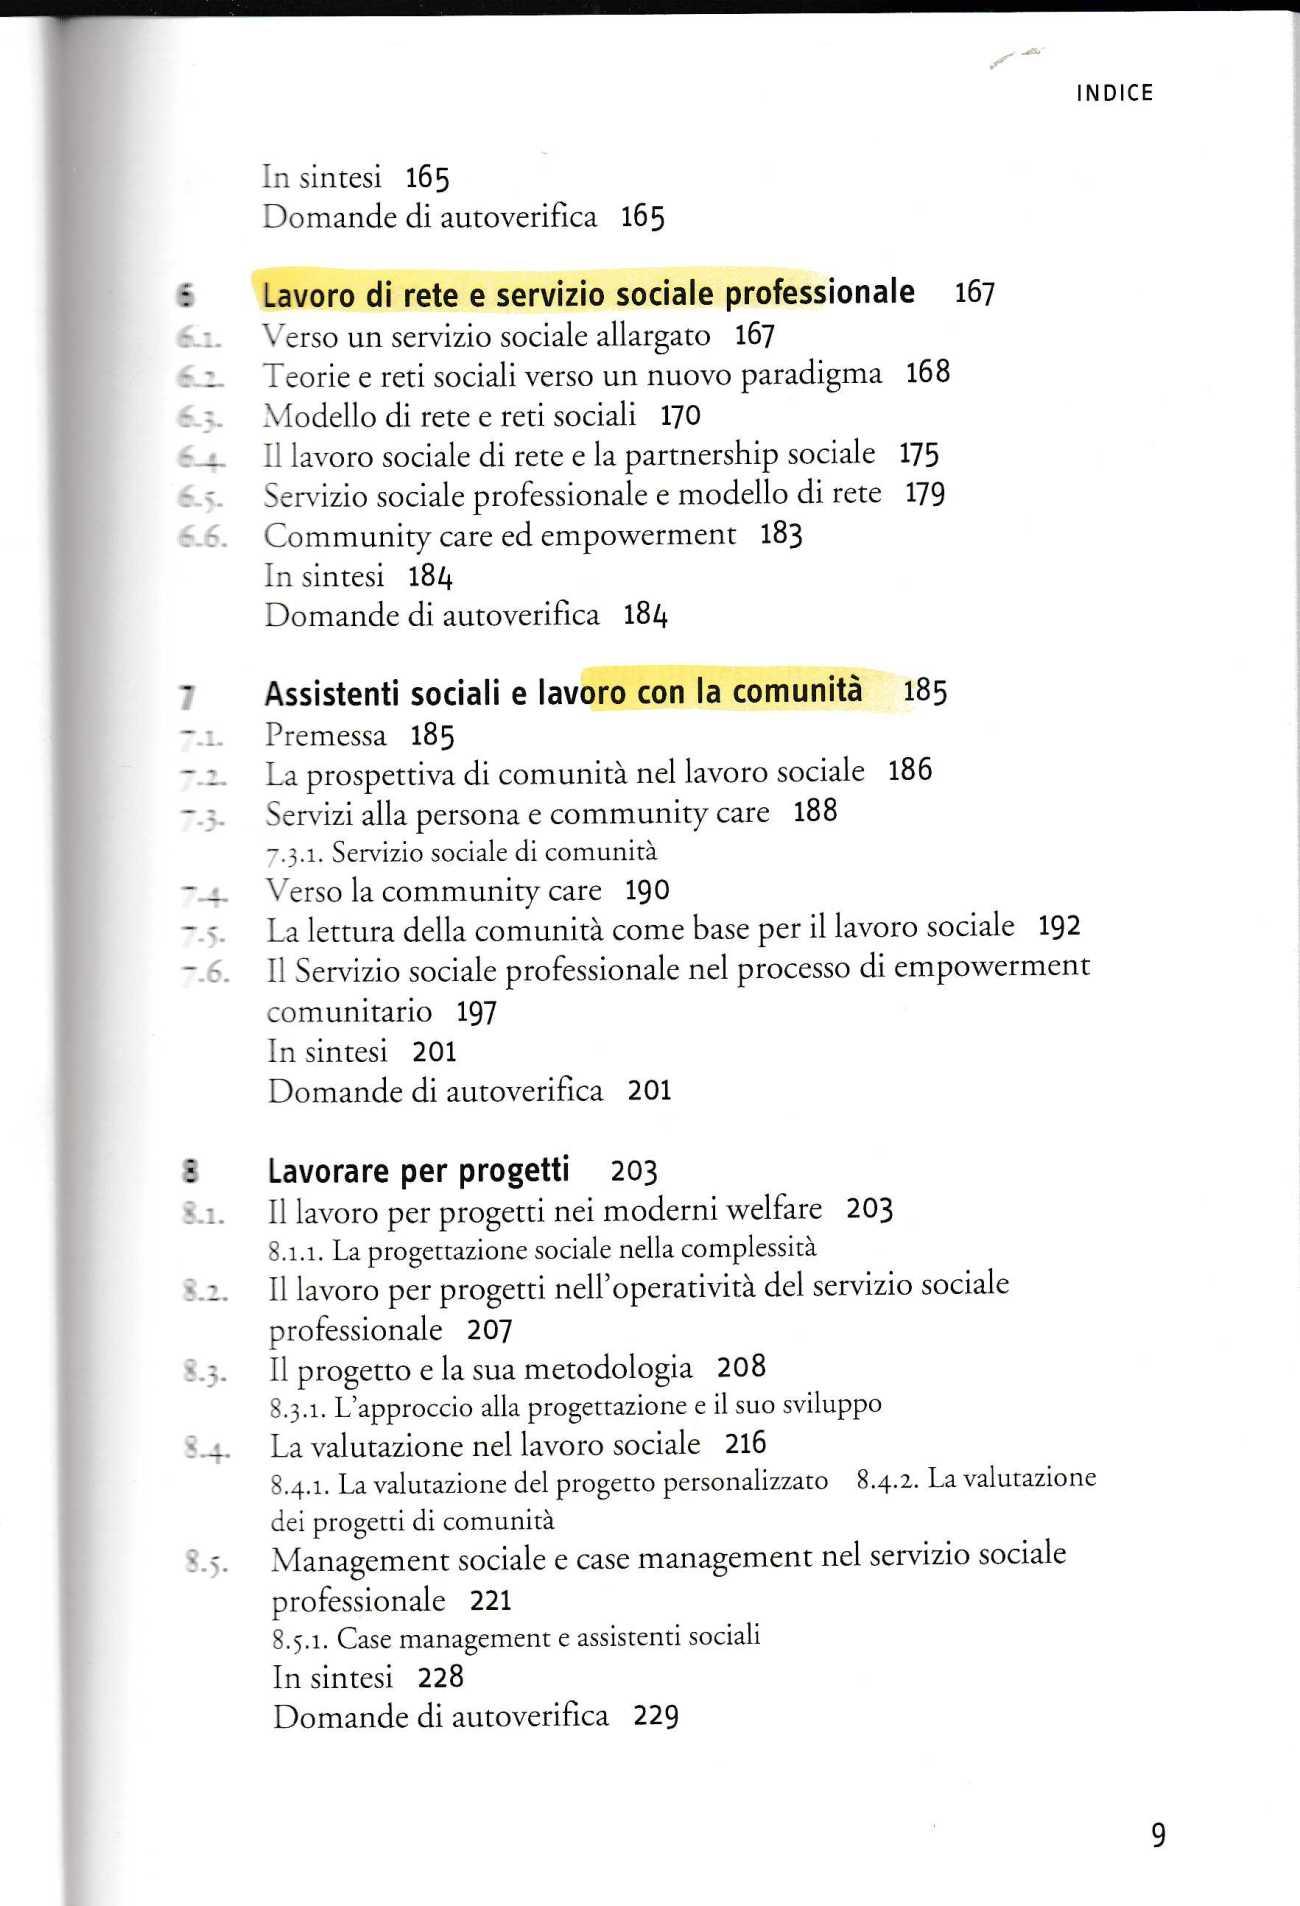 ZILIANTI ROVAI2157